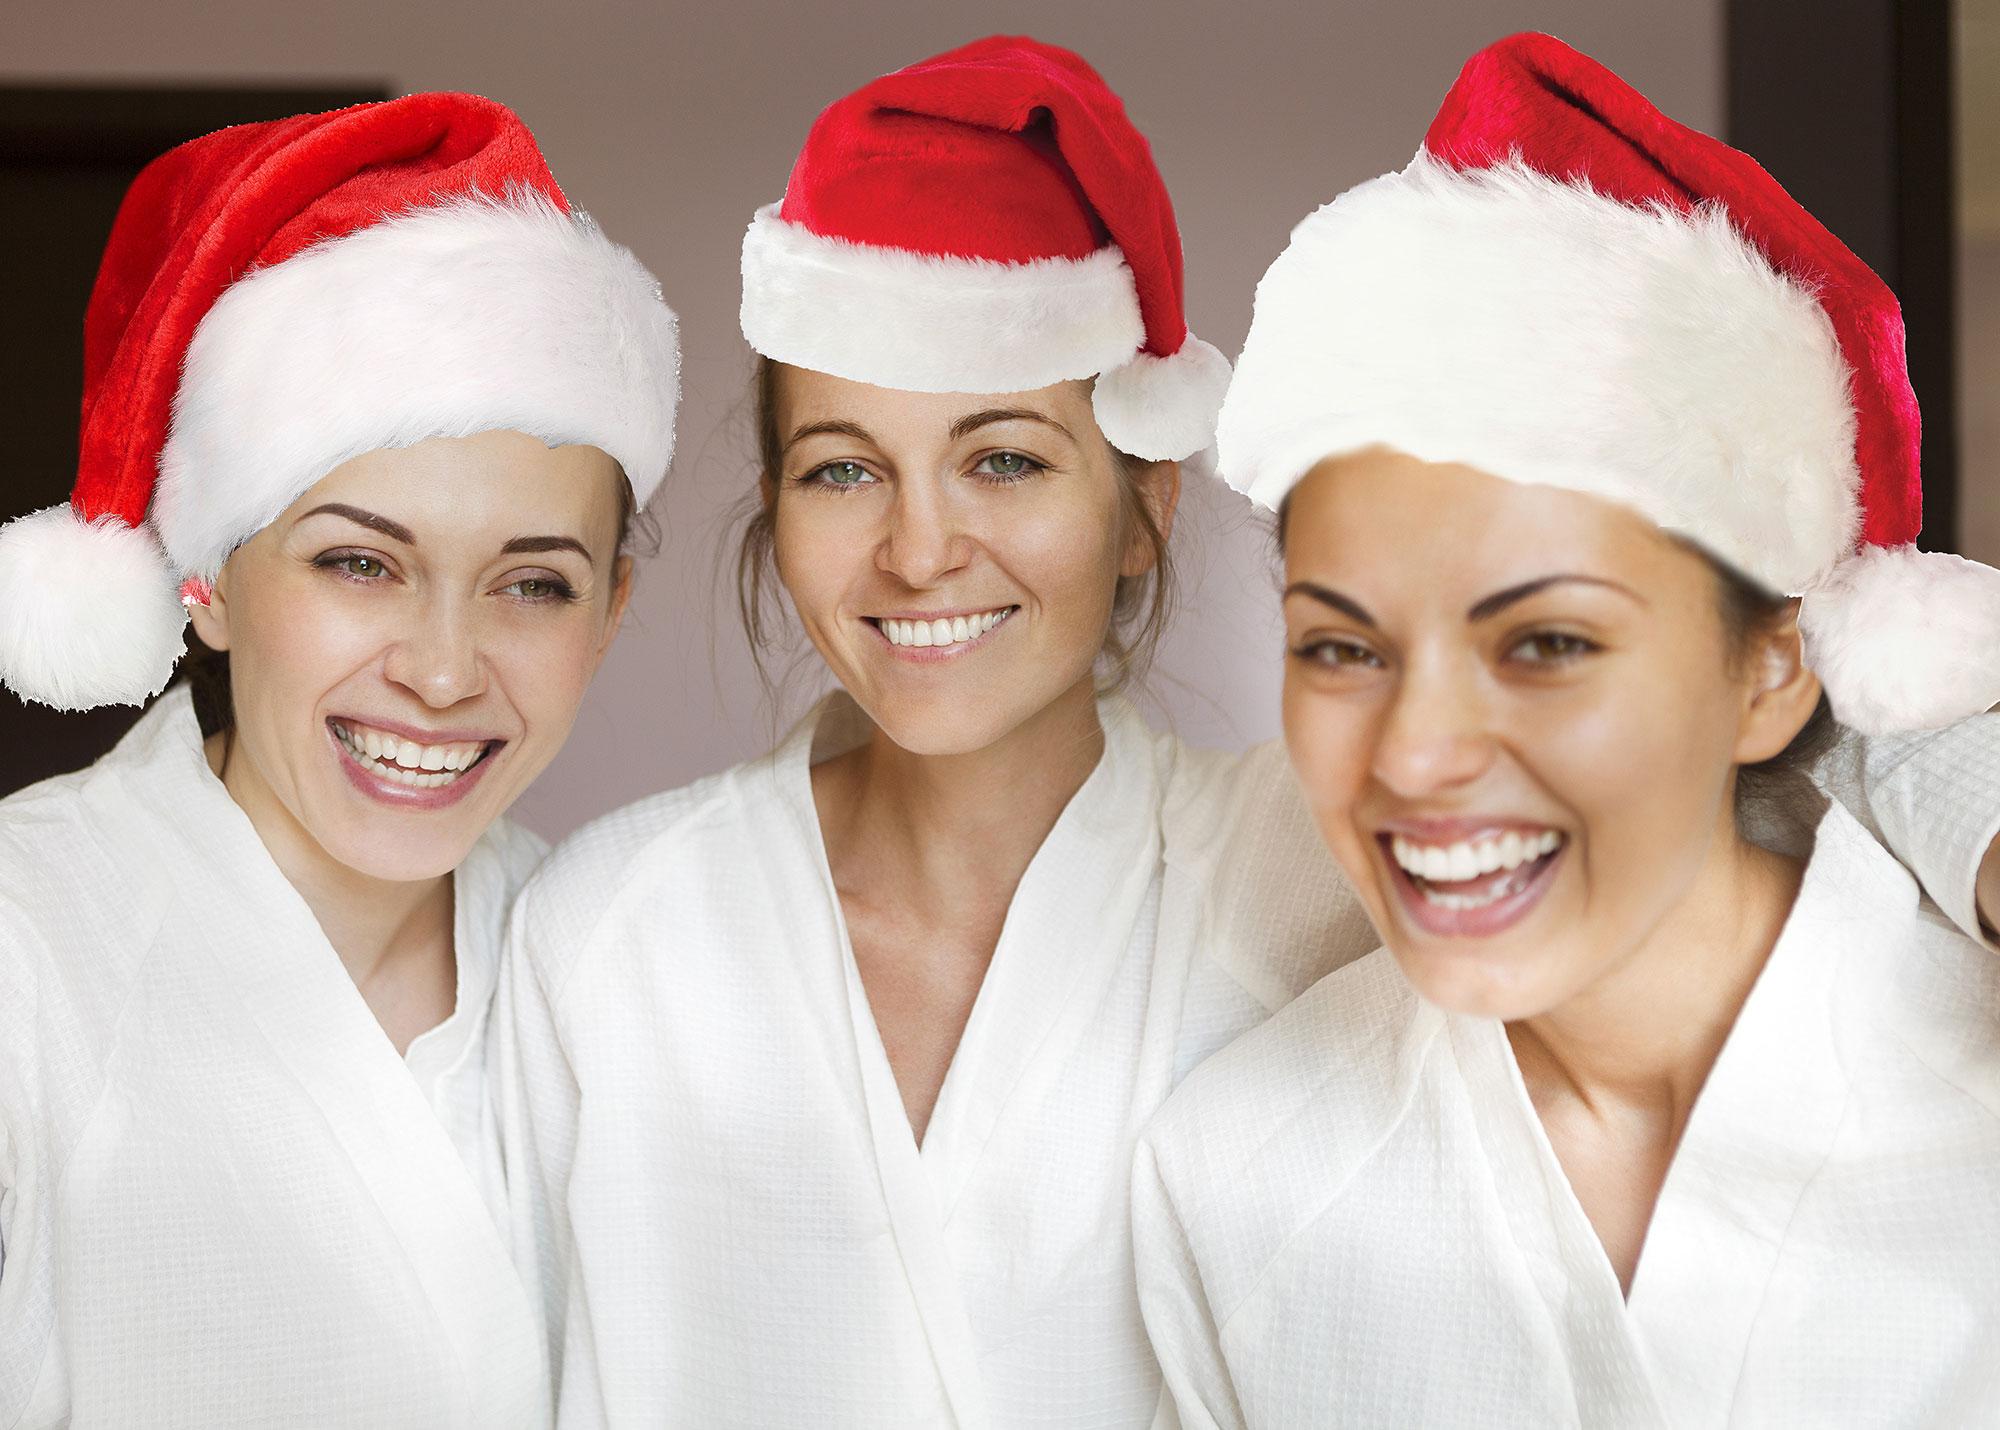 spa membership the best gift